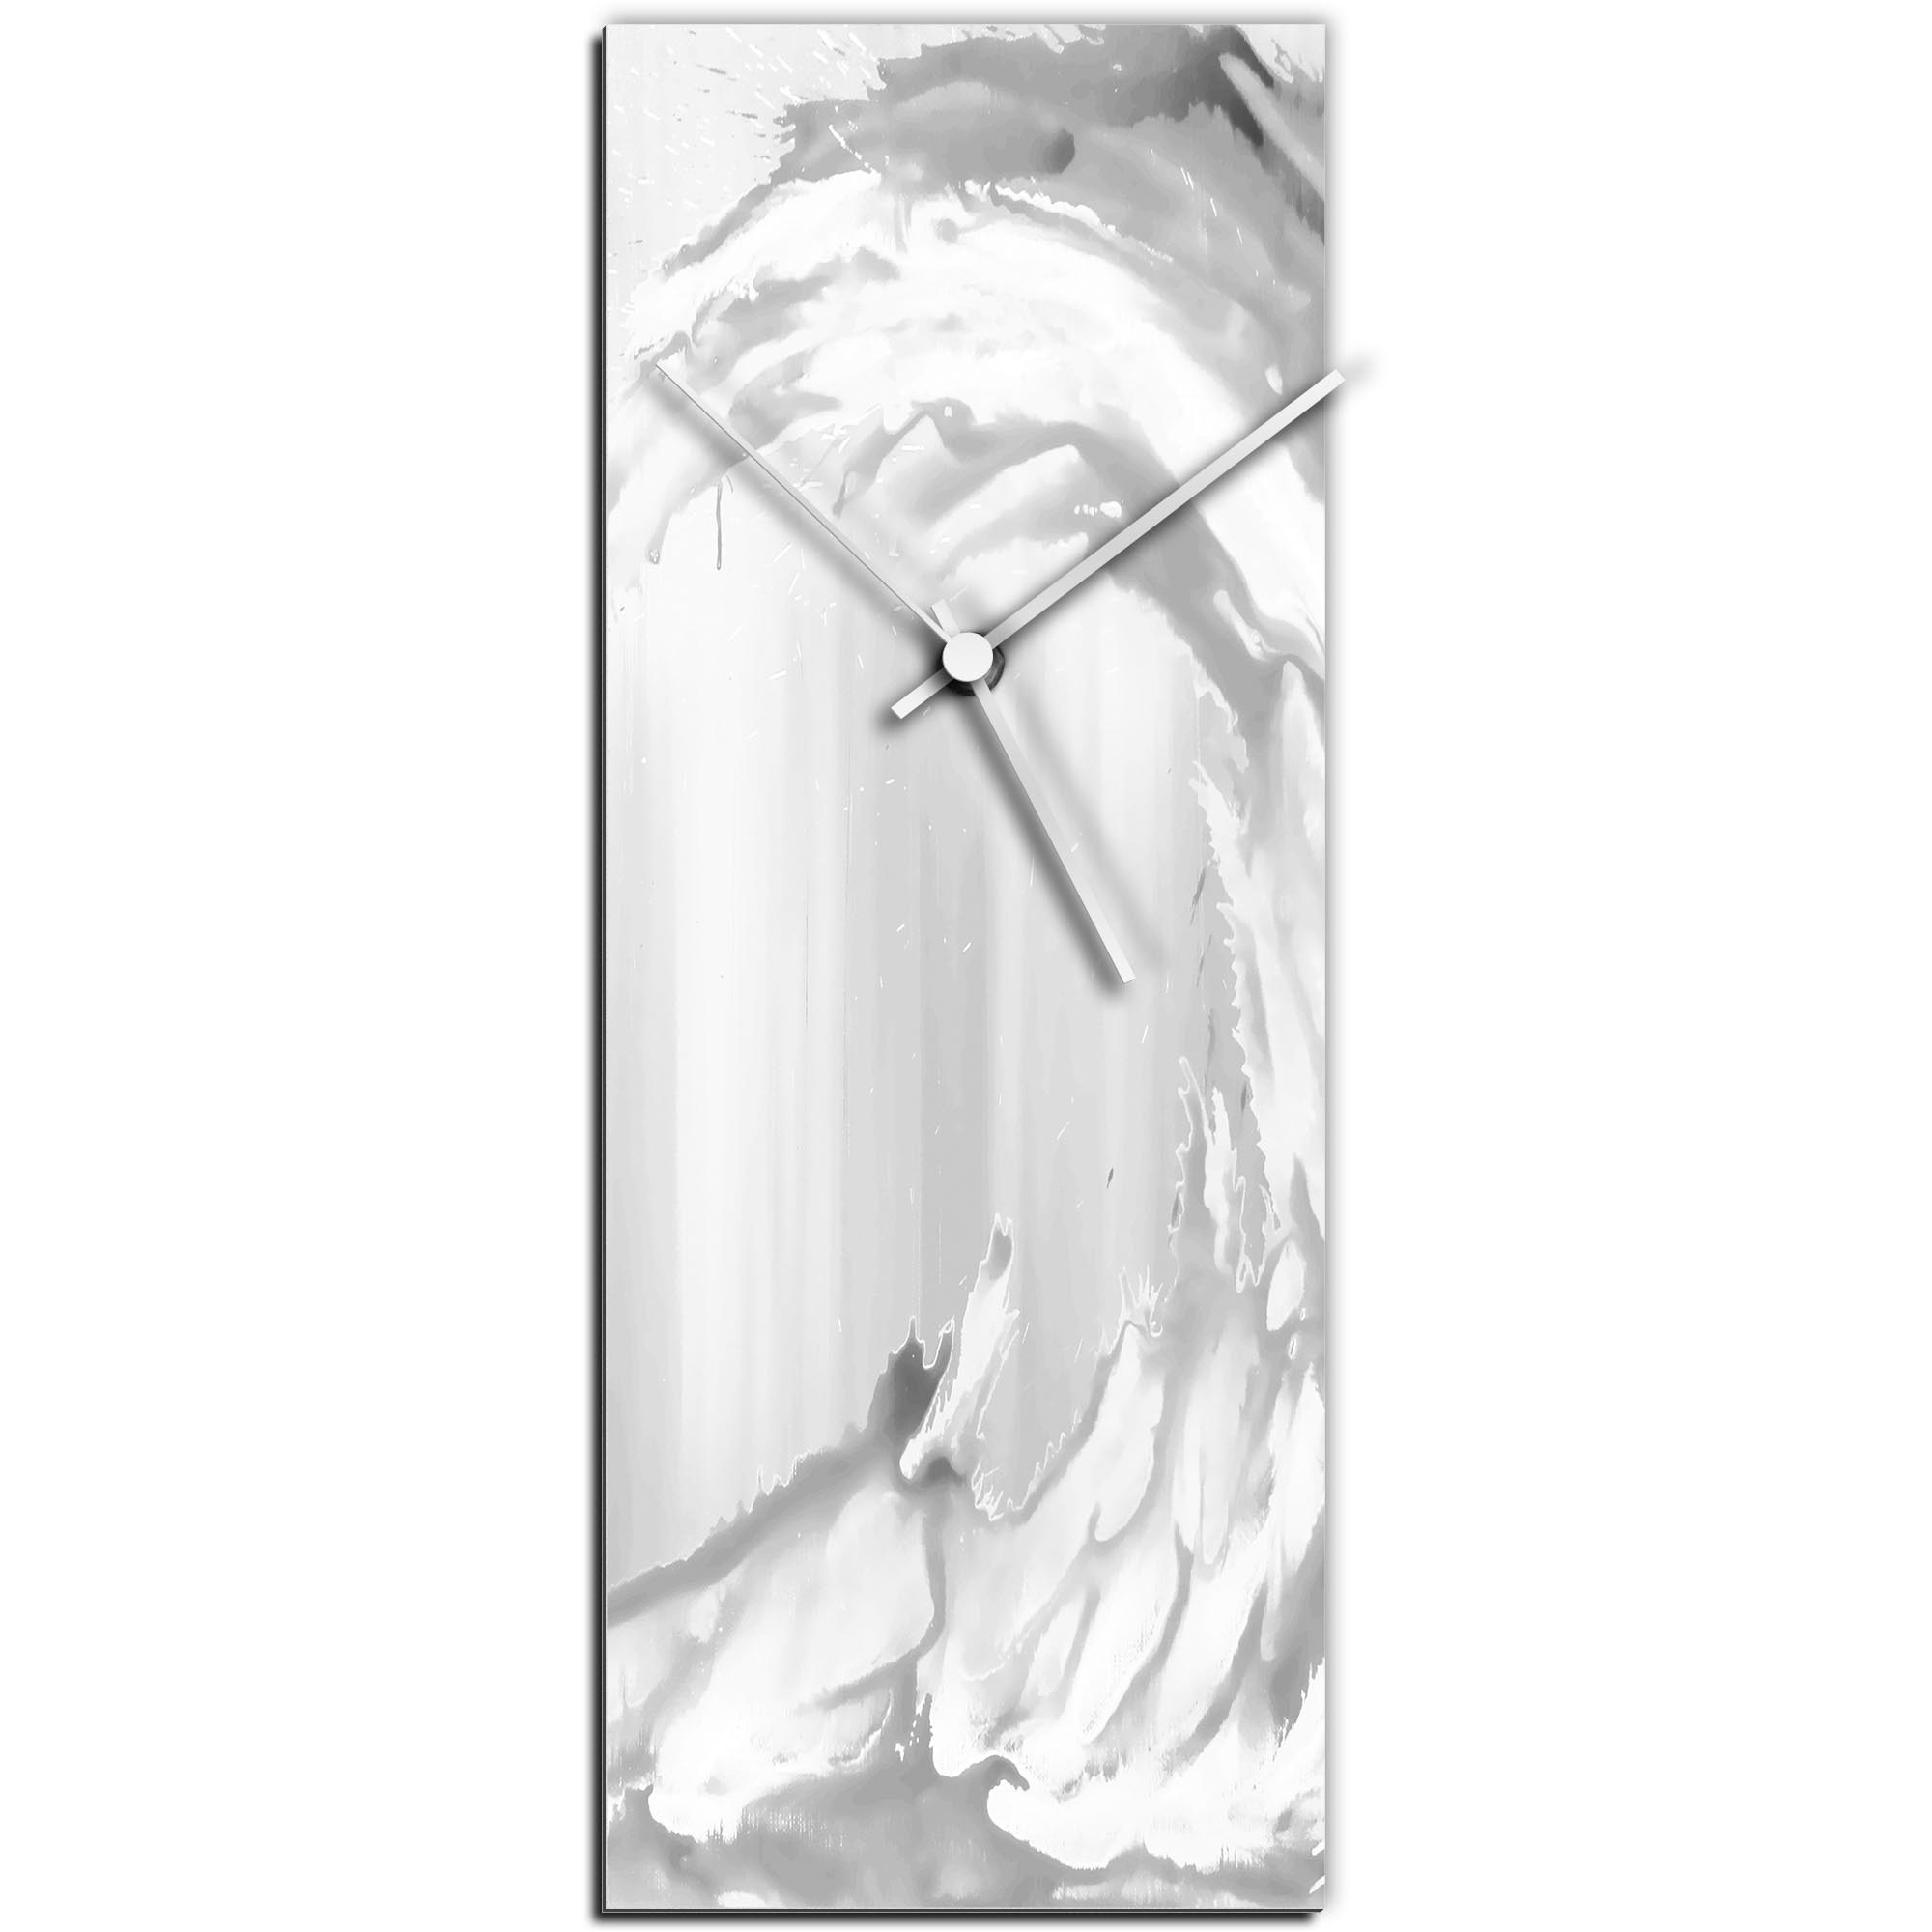 Mendo Vasilevski 'White Wave v2 Clock' 6in x 16in Modern Wall Clock on Aluminum Composite